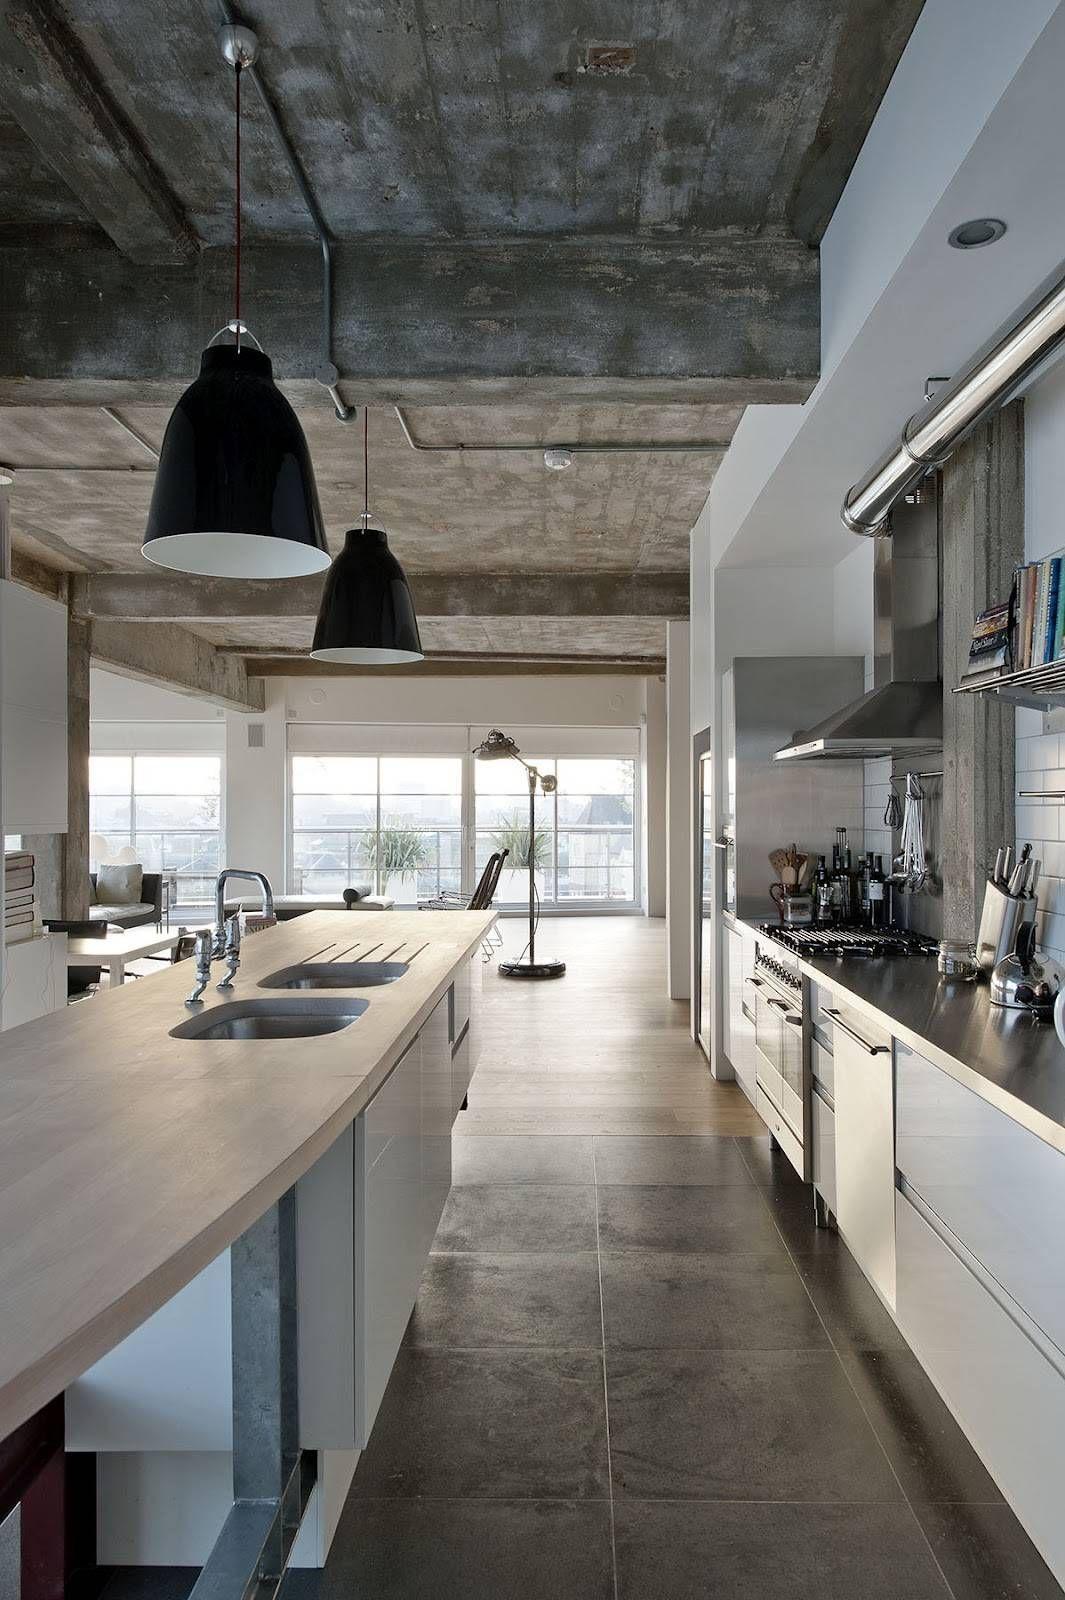 Pavimento Cucina Industriale | Pavimento Cucina Affordable Cucina ...